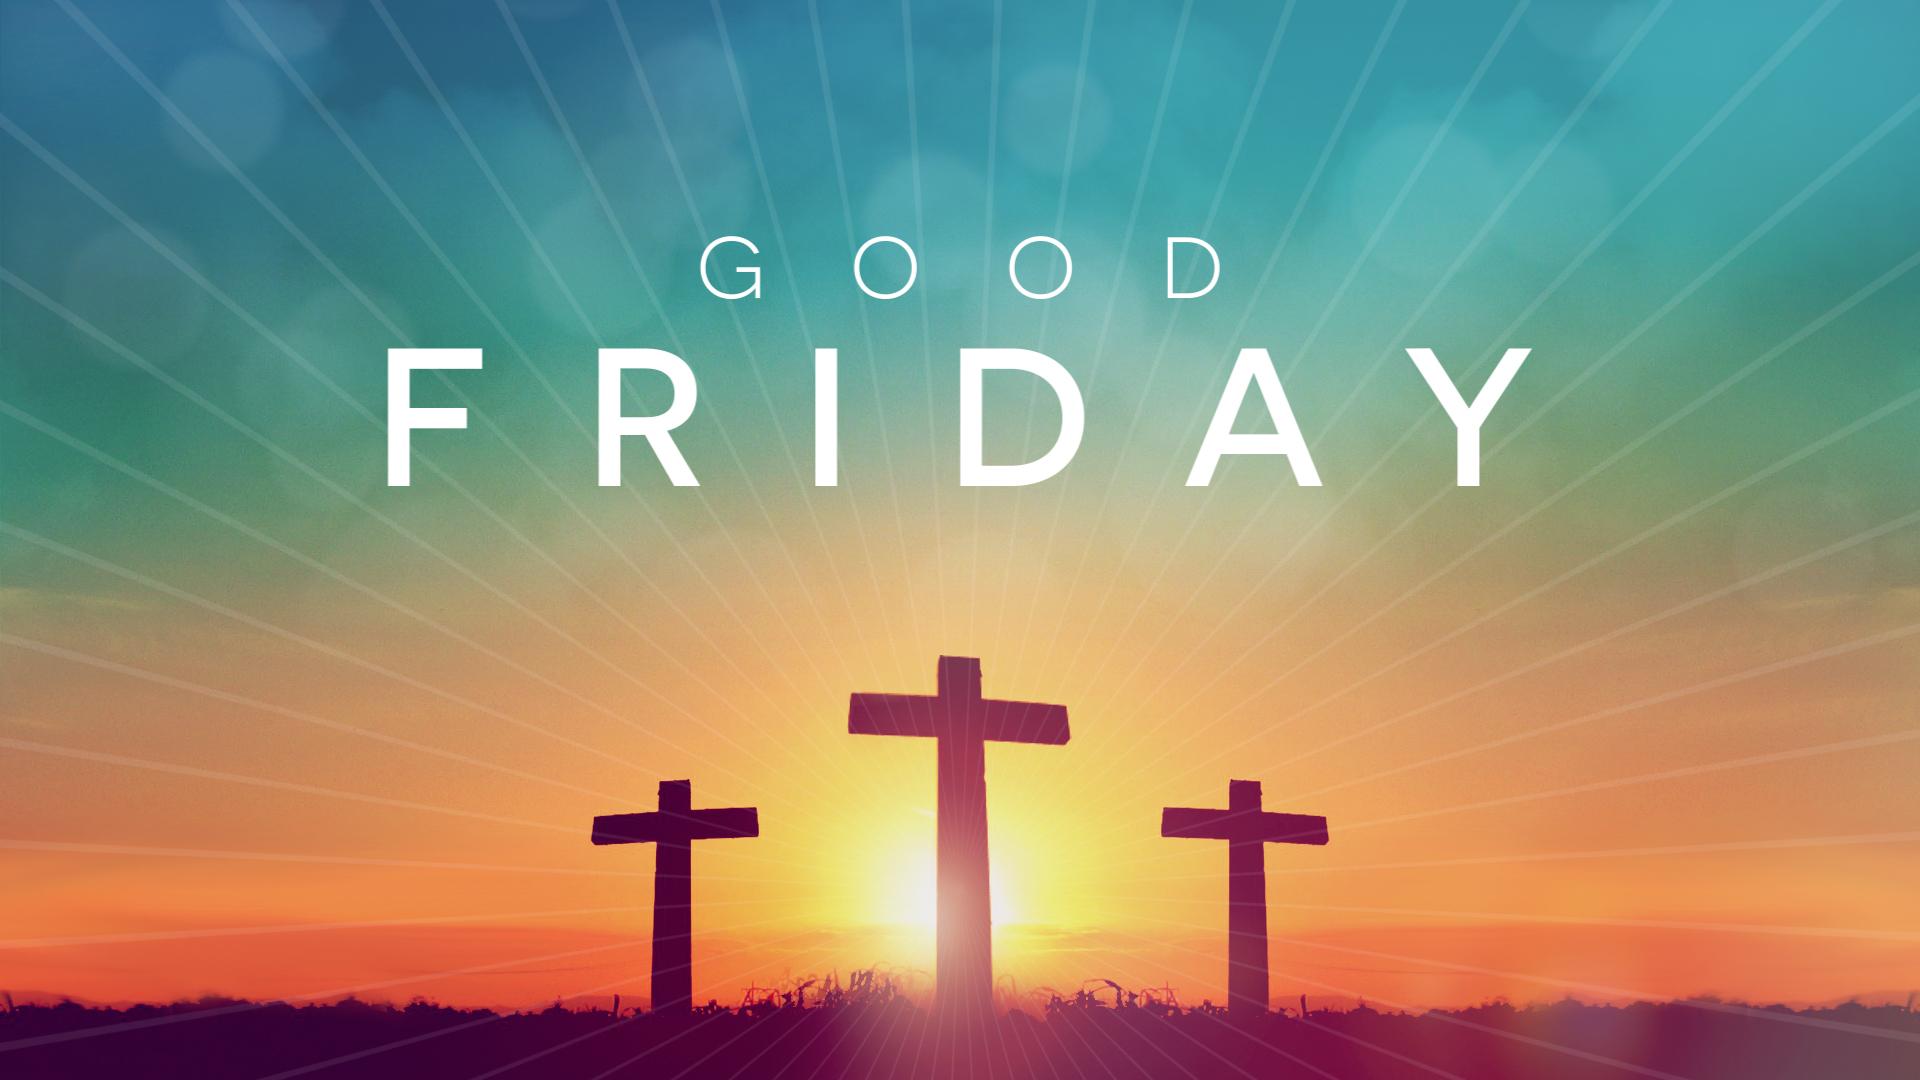 Christian Calendar April 14 Catholic Encyclopedia Christian Calendar Good Friday Quotes Wishes Images Sayings Greetings